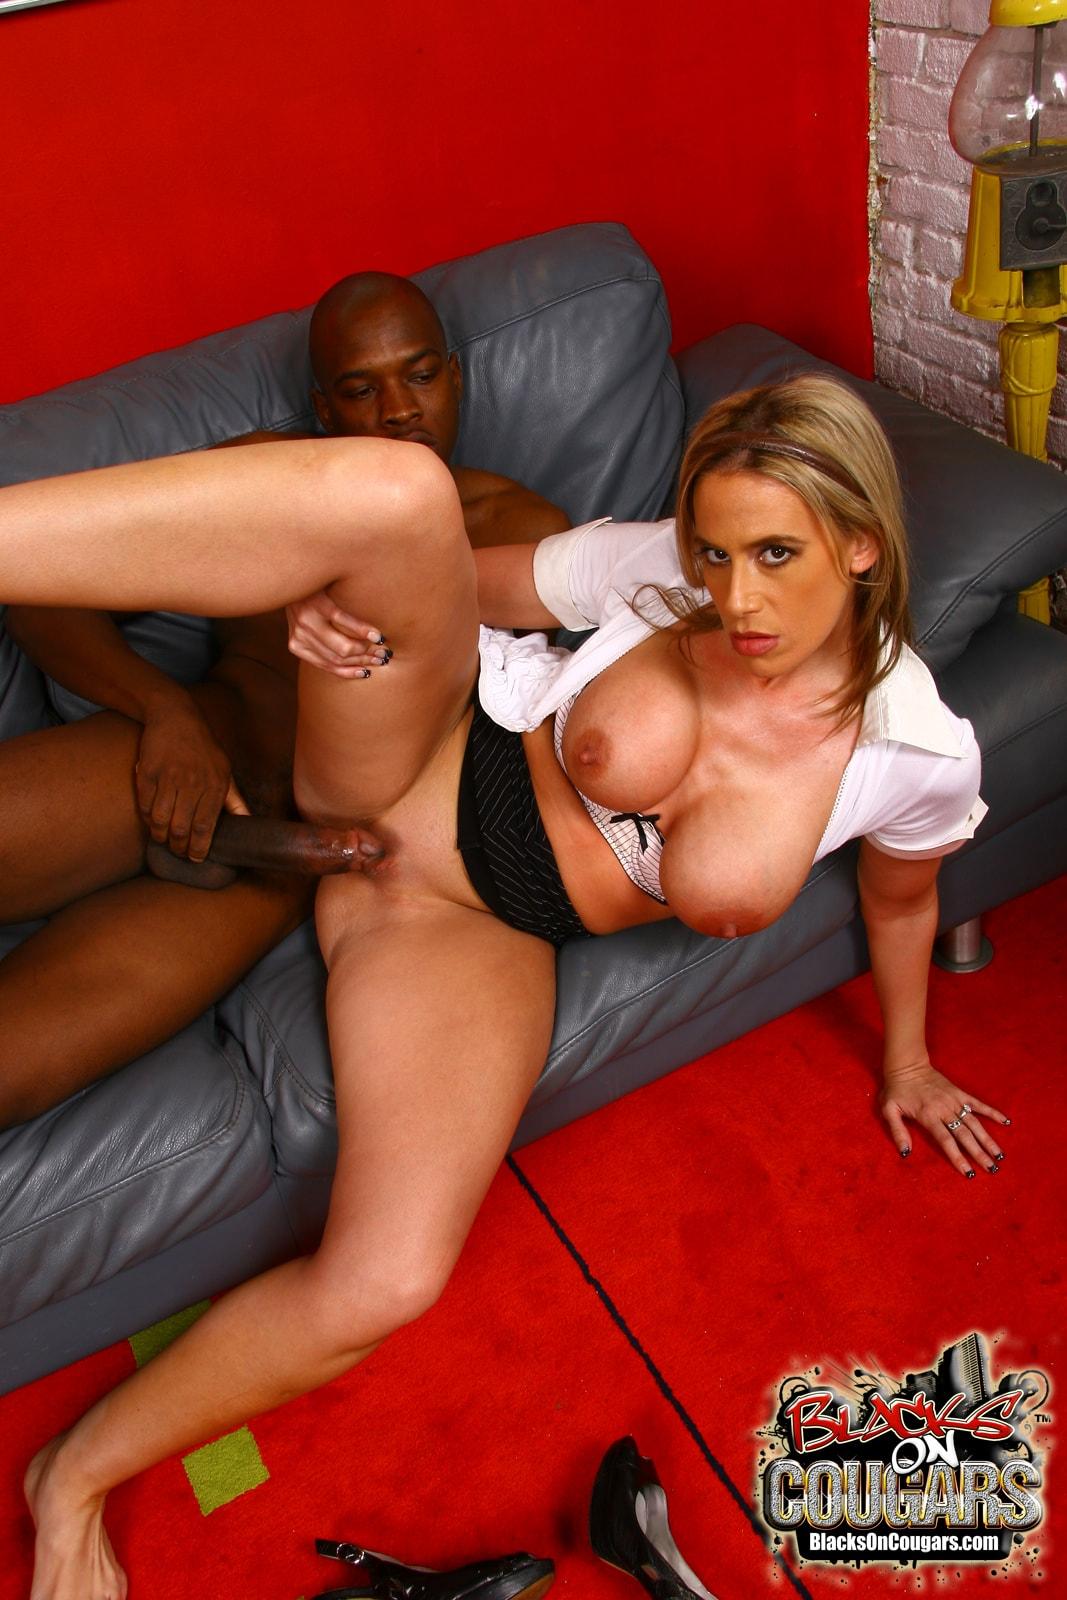 Dogfart '- Blacks On Cougars' starring Kylie Worthy (Photo 25)